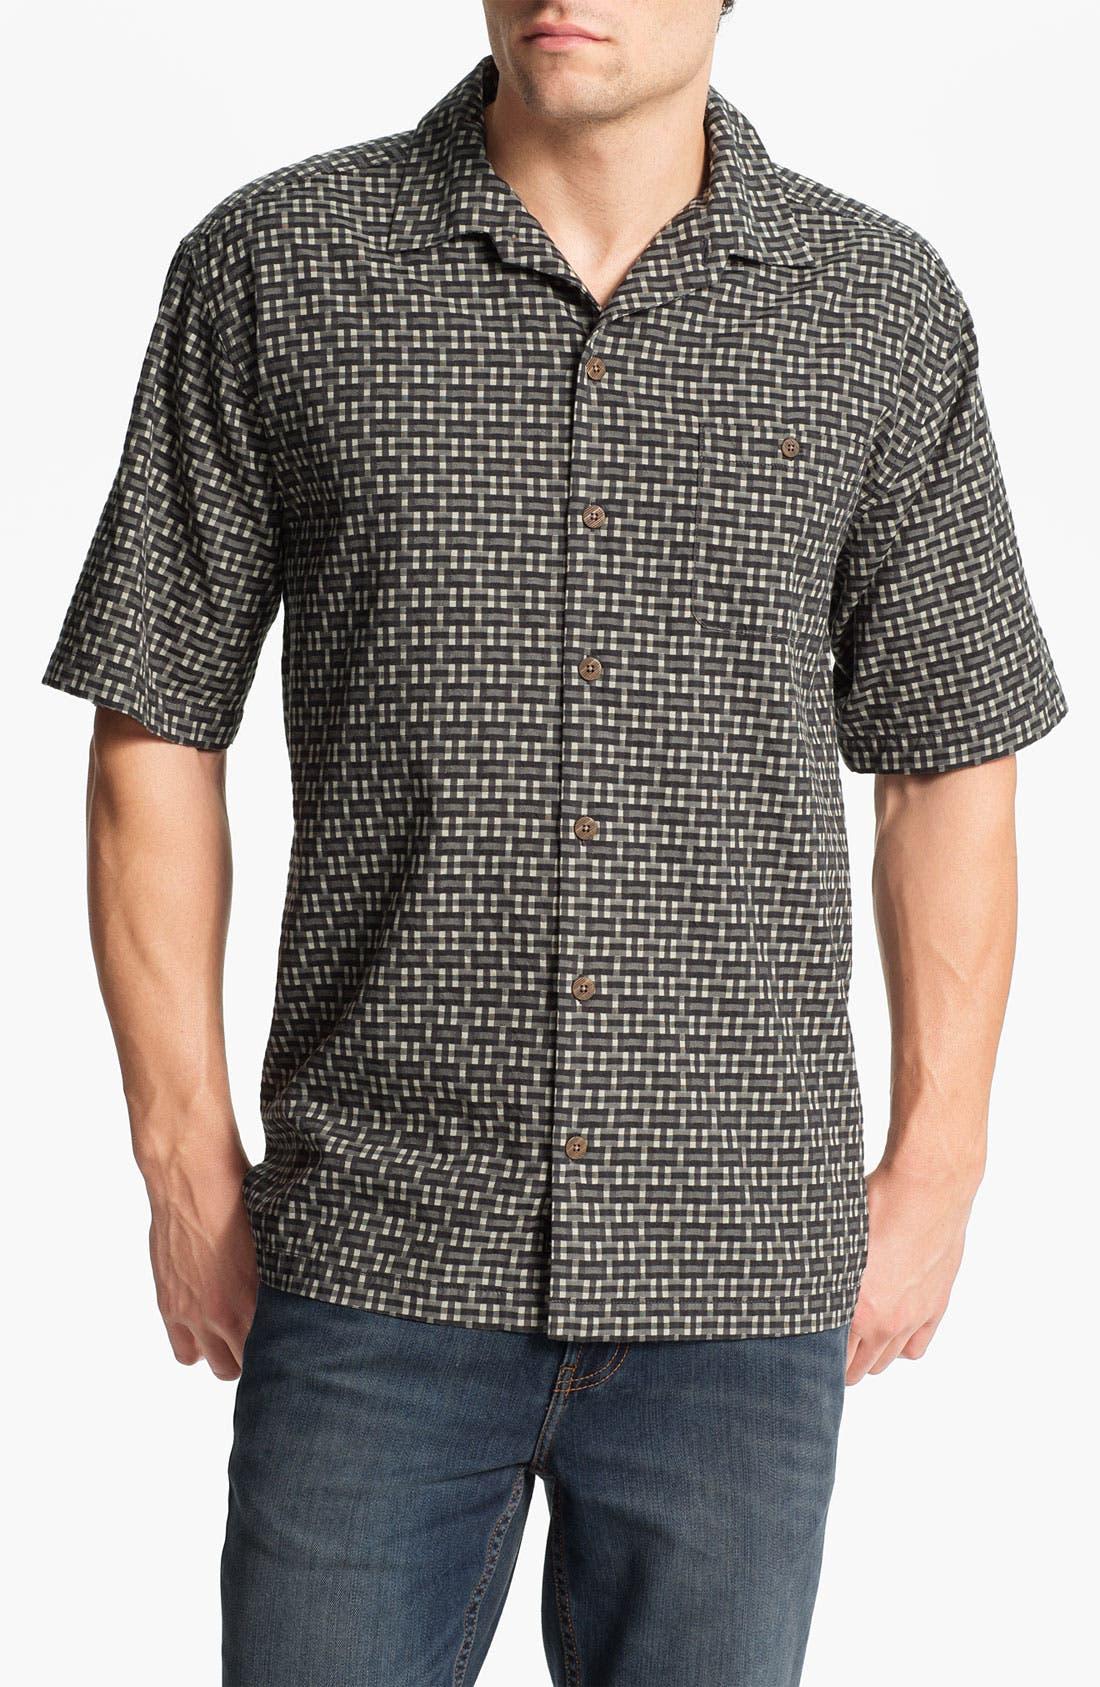 Main Image - Tommy Bahama 'Caracas Check' Silk & Cotton Campshirt